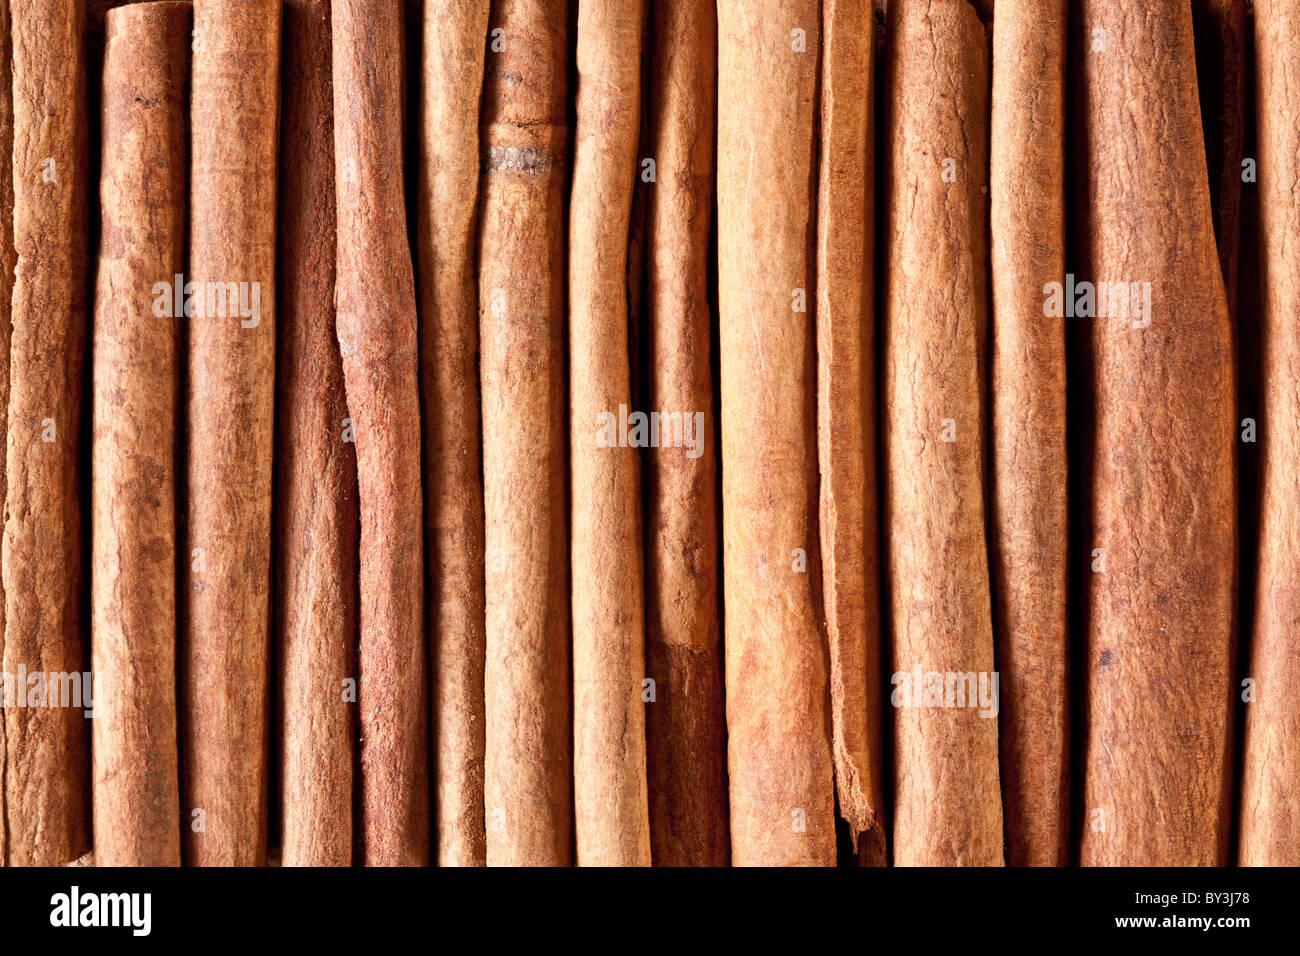 Imagen de textura de canela. Imagen De Stock